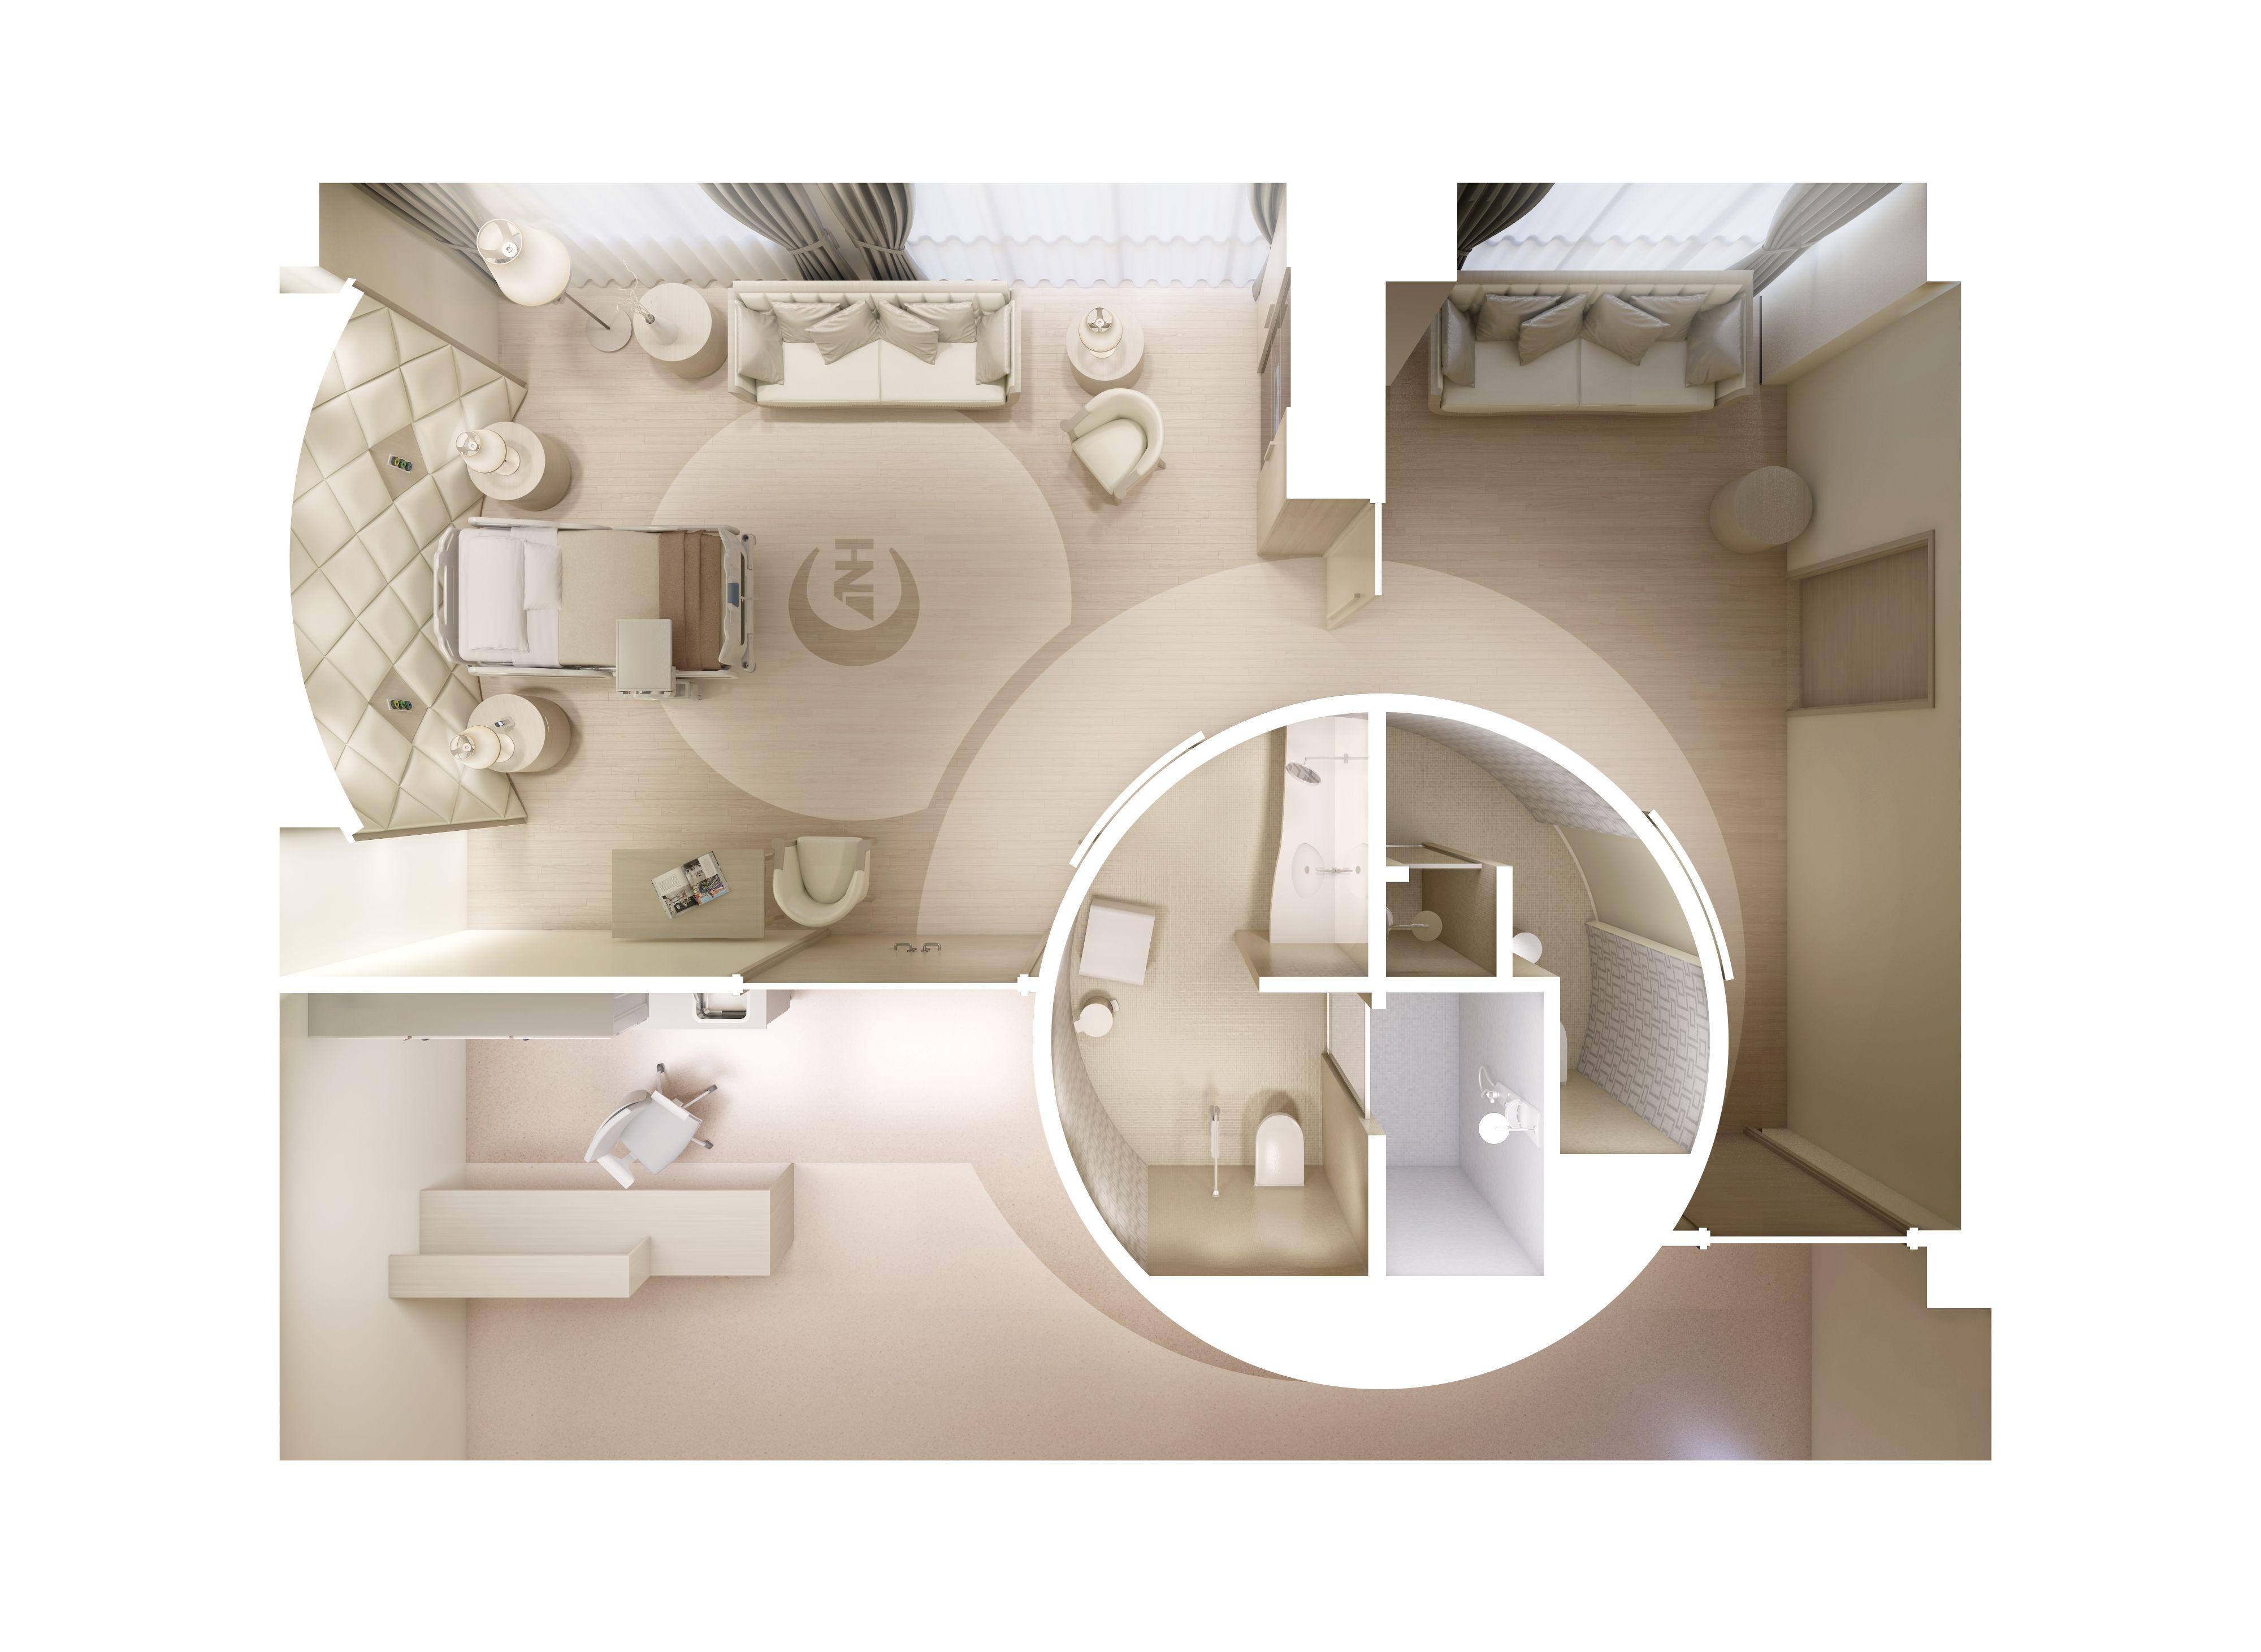 Private hospital room plan - Hospital Royal Suite Plan